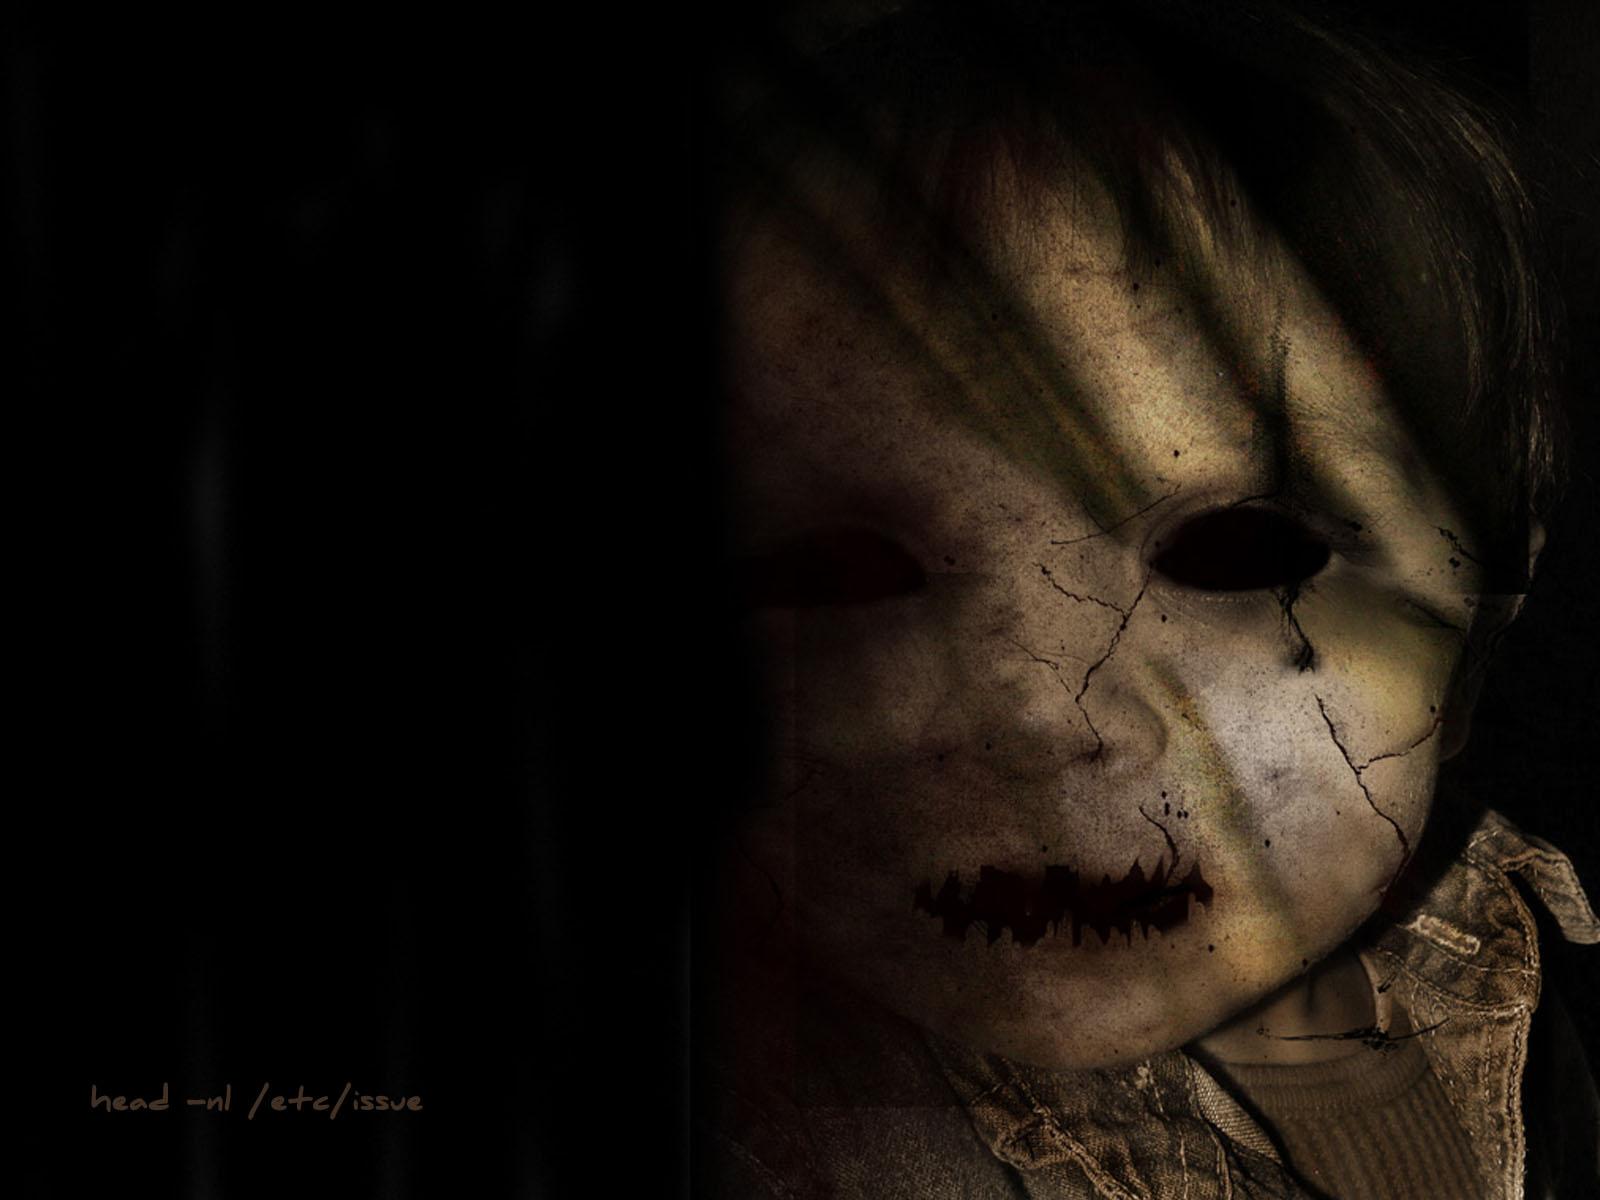 Halloween Spooky Wallpaper.Wallpaper World Scary Halloween Wallpapers